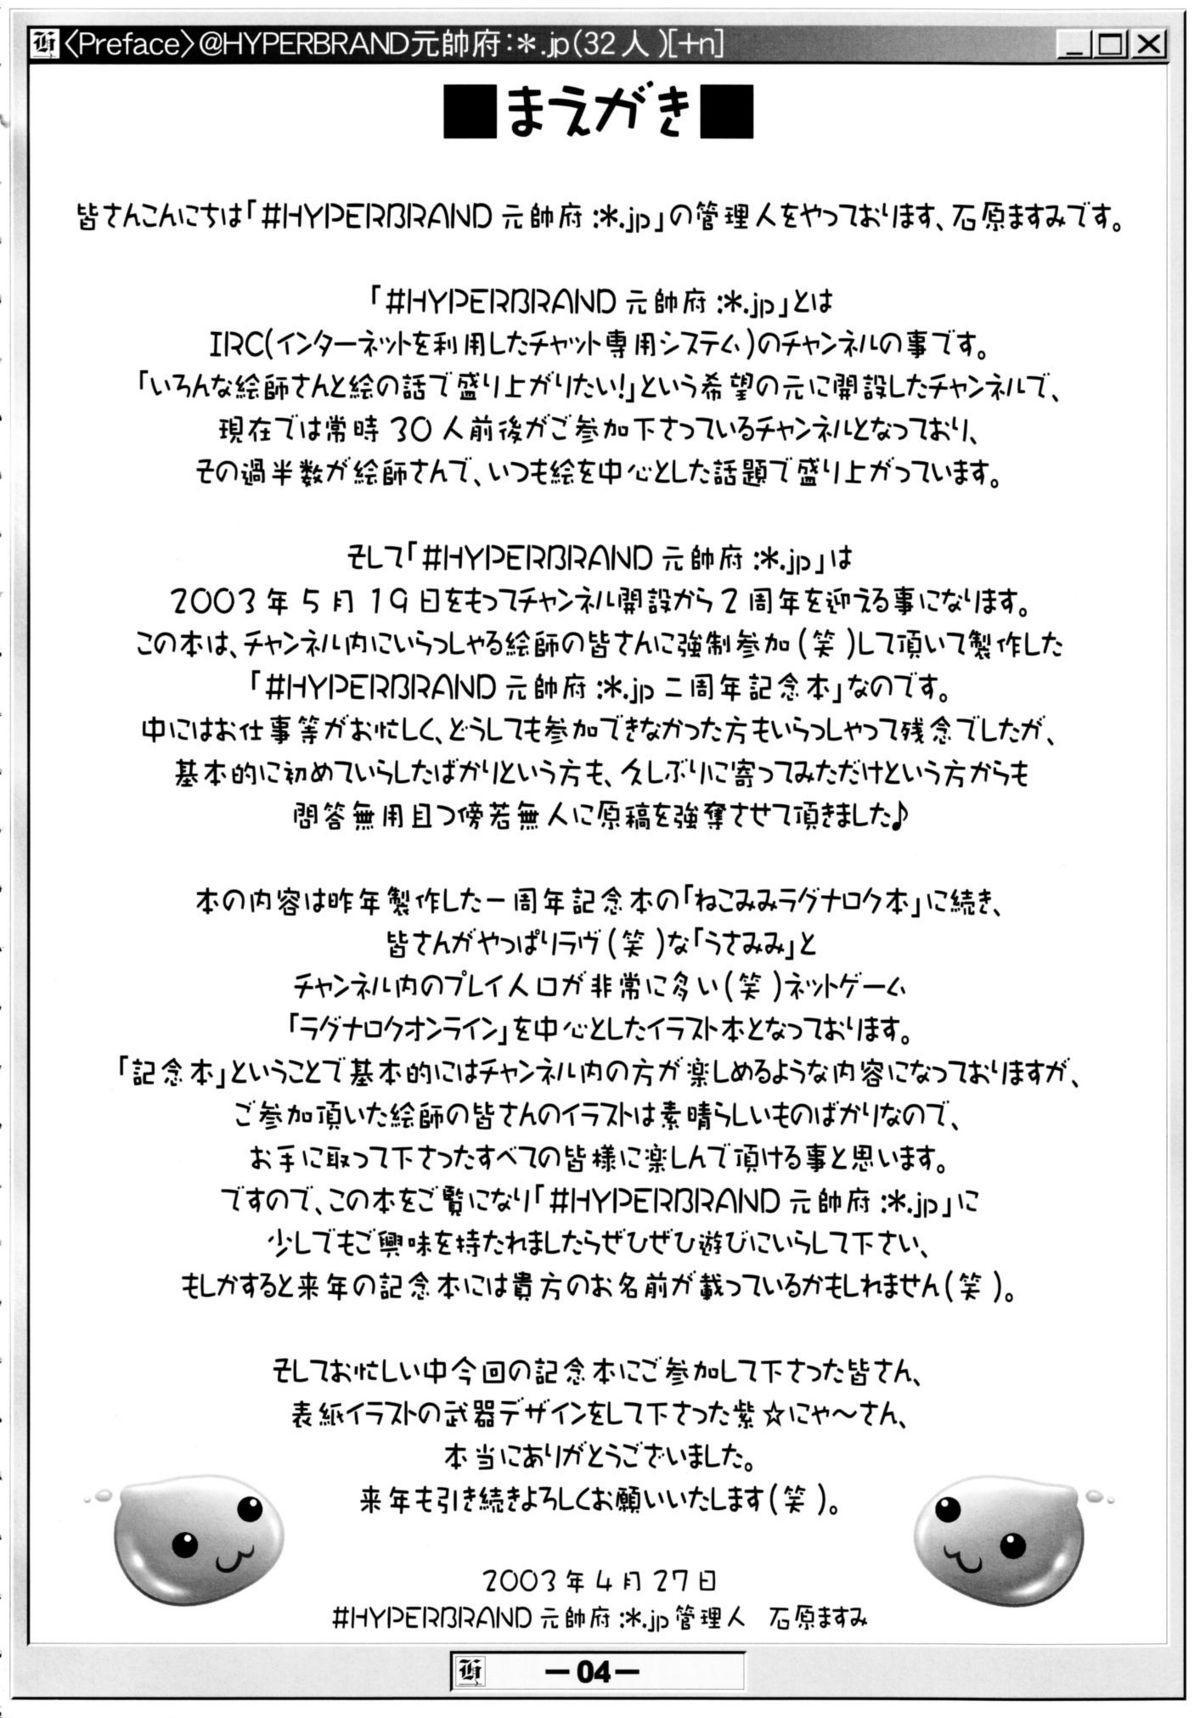 (Puniket 07) [HYPER BRAND (Deden, Ishihara Masumi, Kawamura Yasuhito)]  (Ragnarok Online) 2